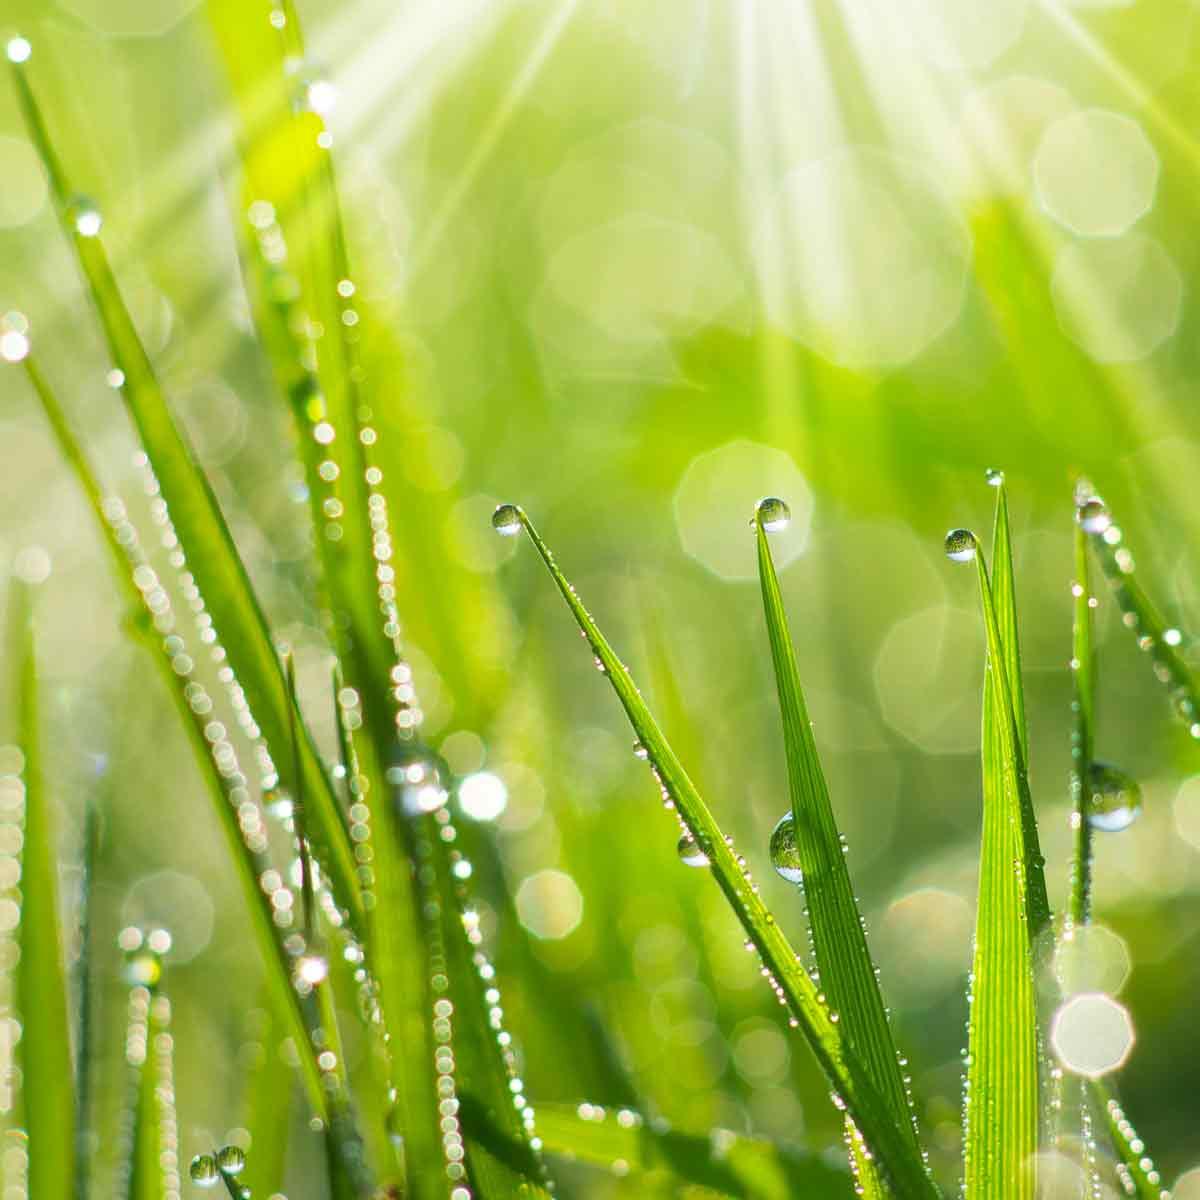 Eloigner Les Fourmis Au Jardin répulsif insecte naturel et traitement maladie | jardins